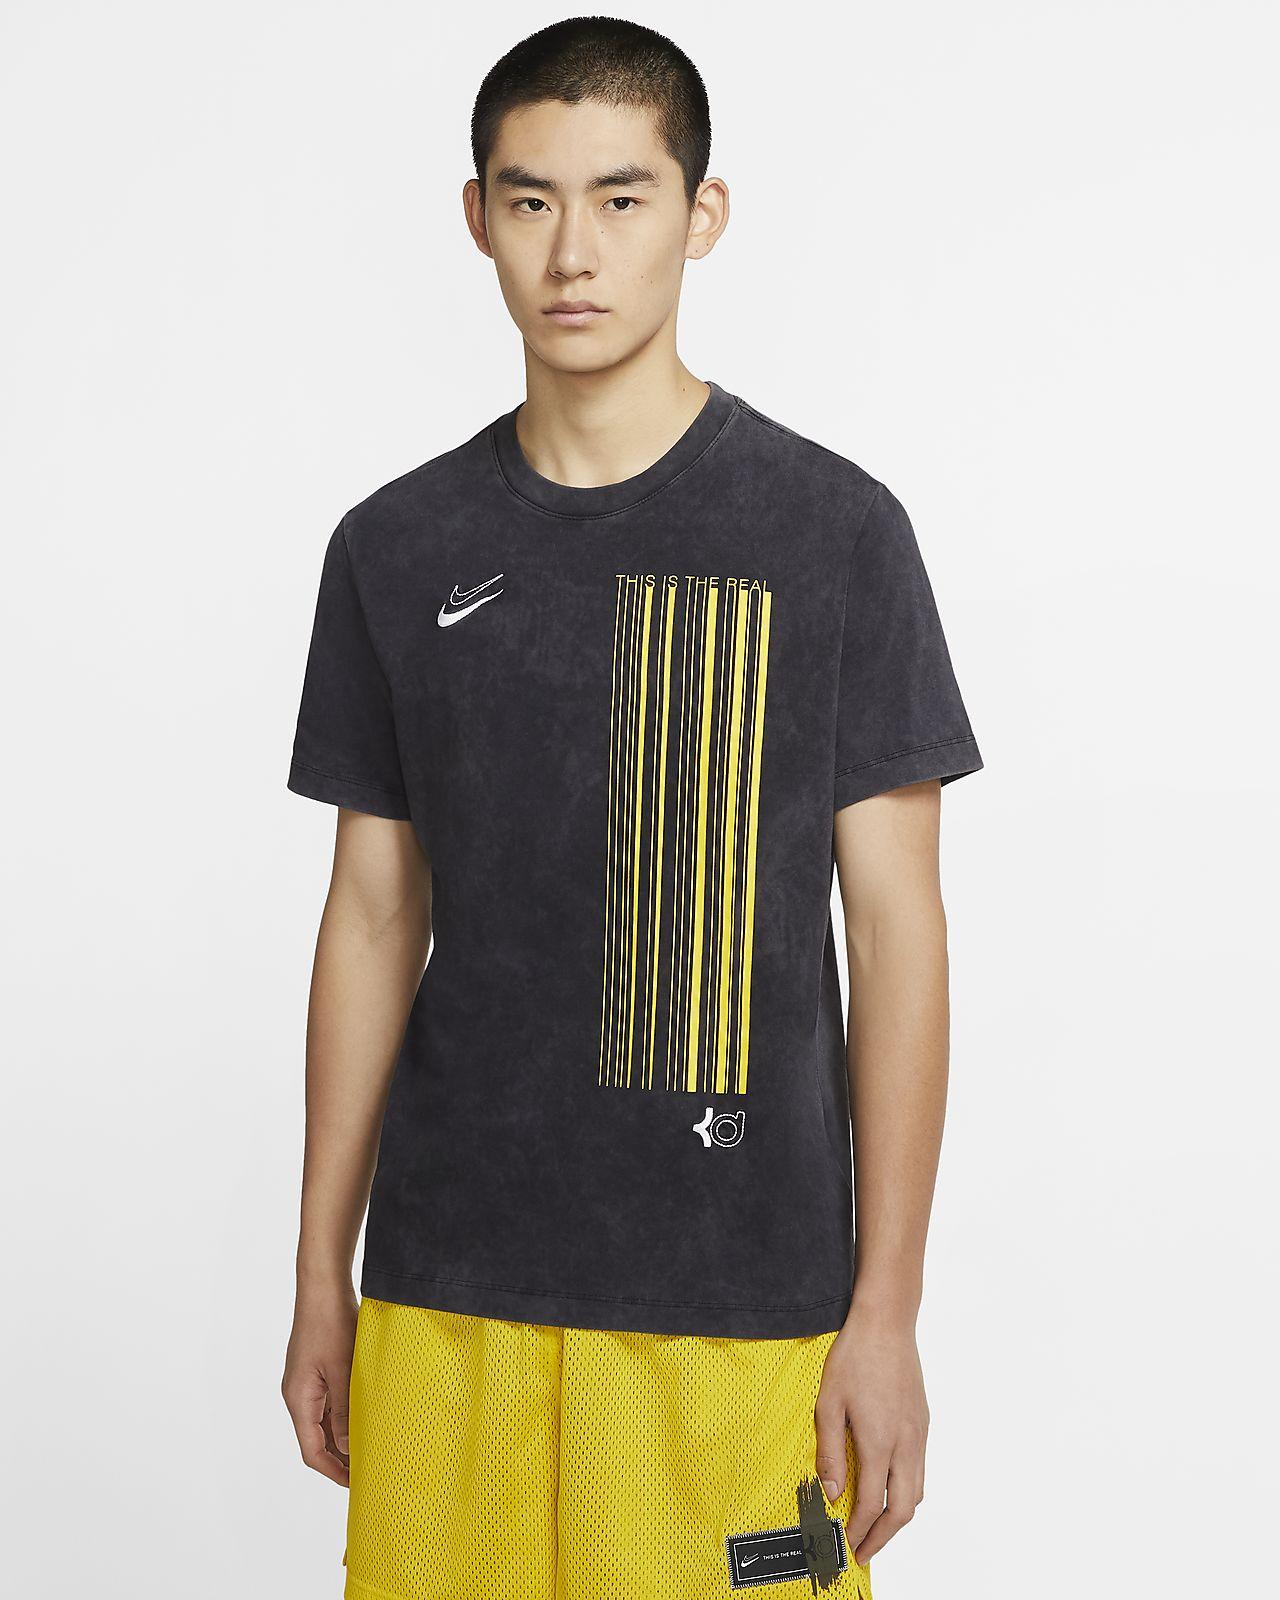 Nike Dri-FIT KD Men's Washed Basketball T-Shirt